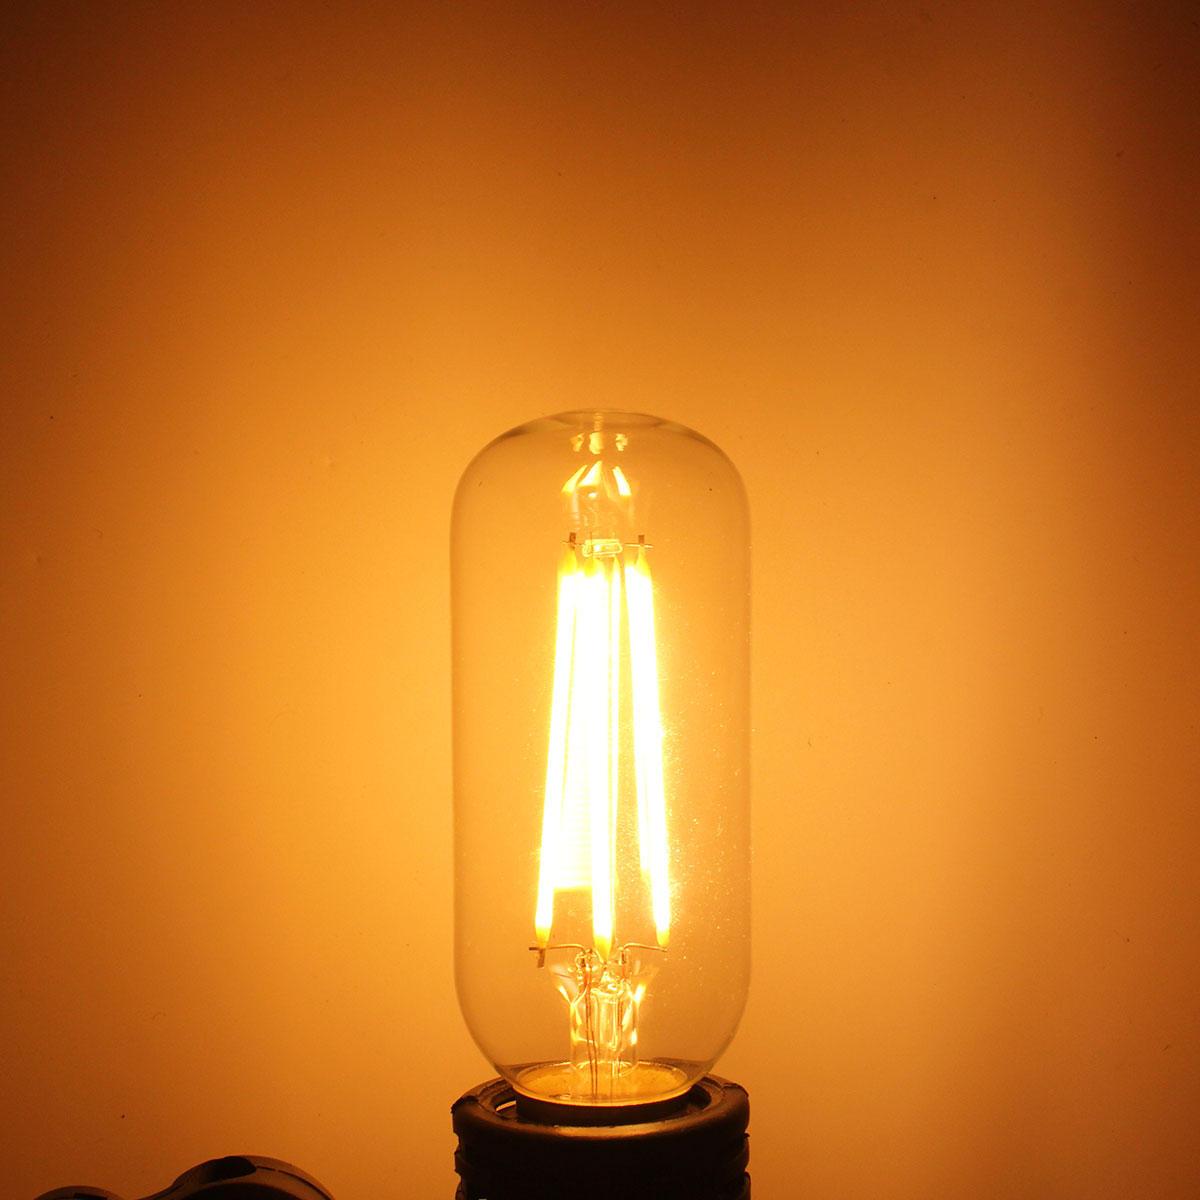 Kingso T45 E26/E27 Dimmable Edison LED Bulbs Warm White COB Vintage Light 400LM 4W 110V/220V